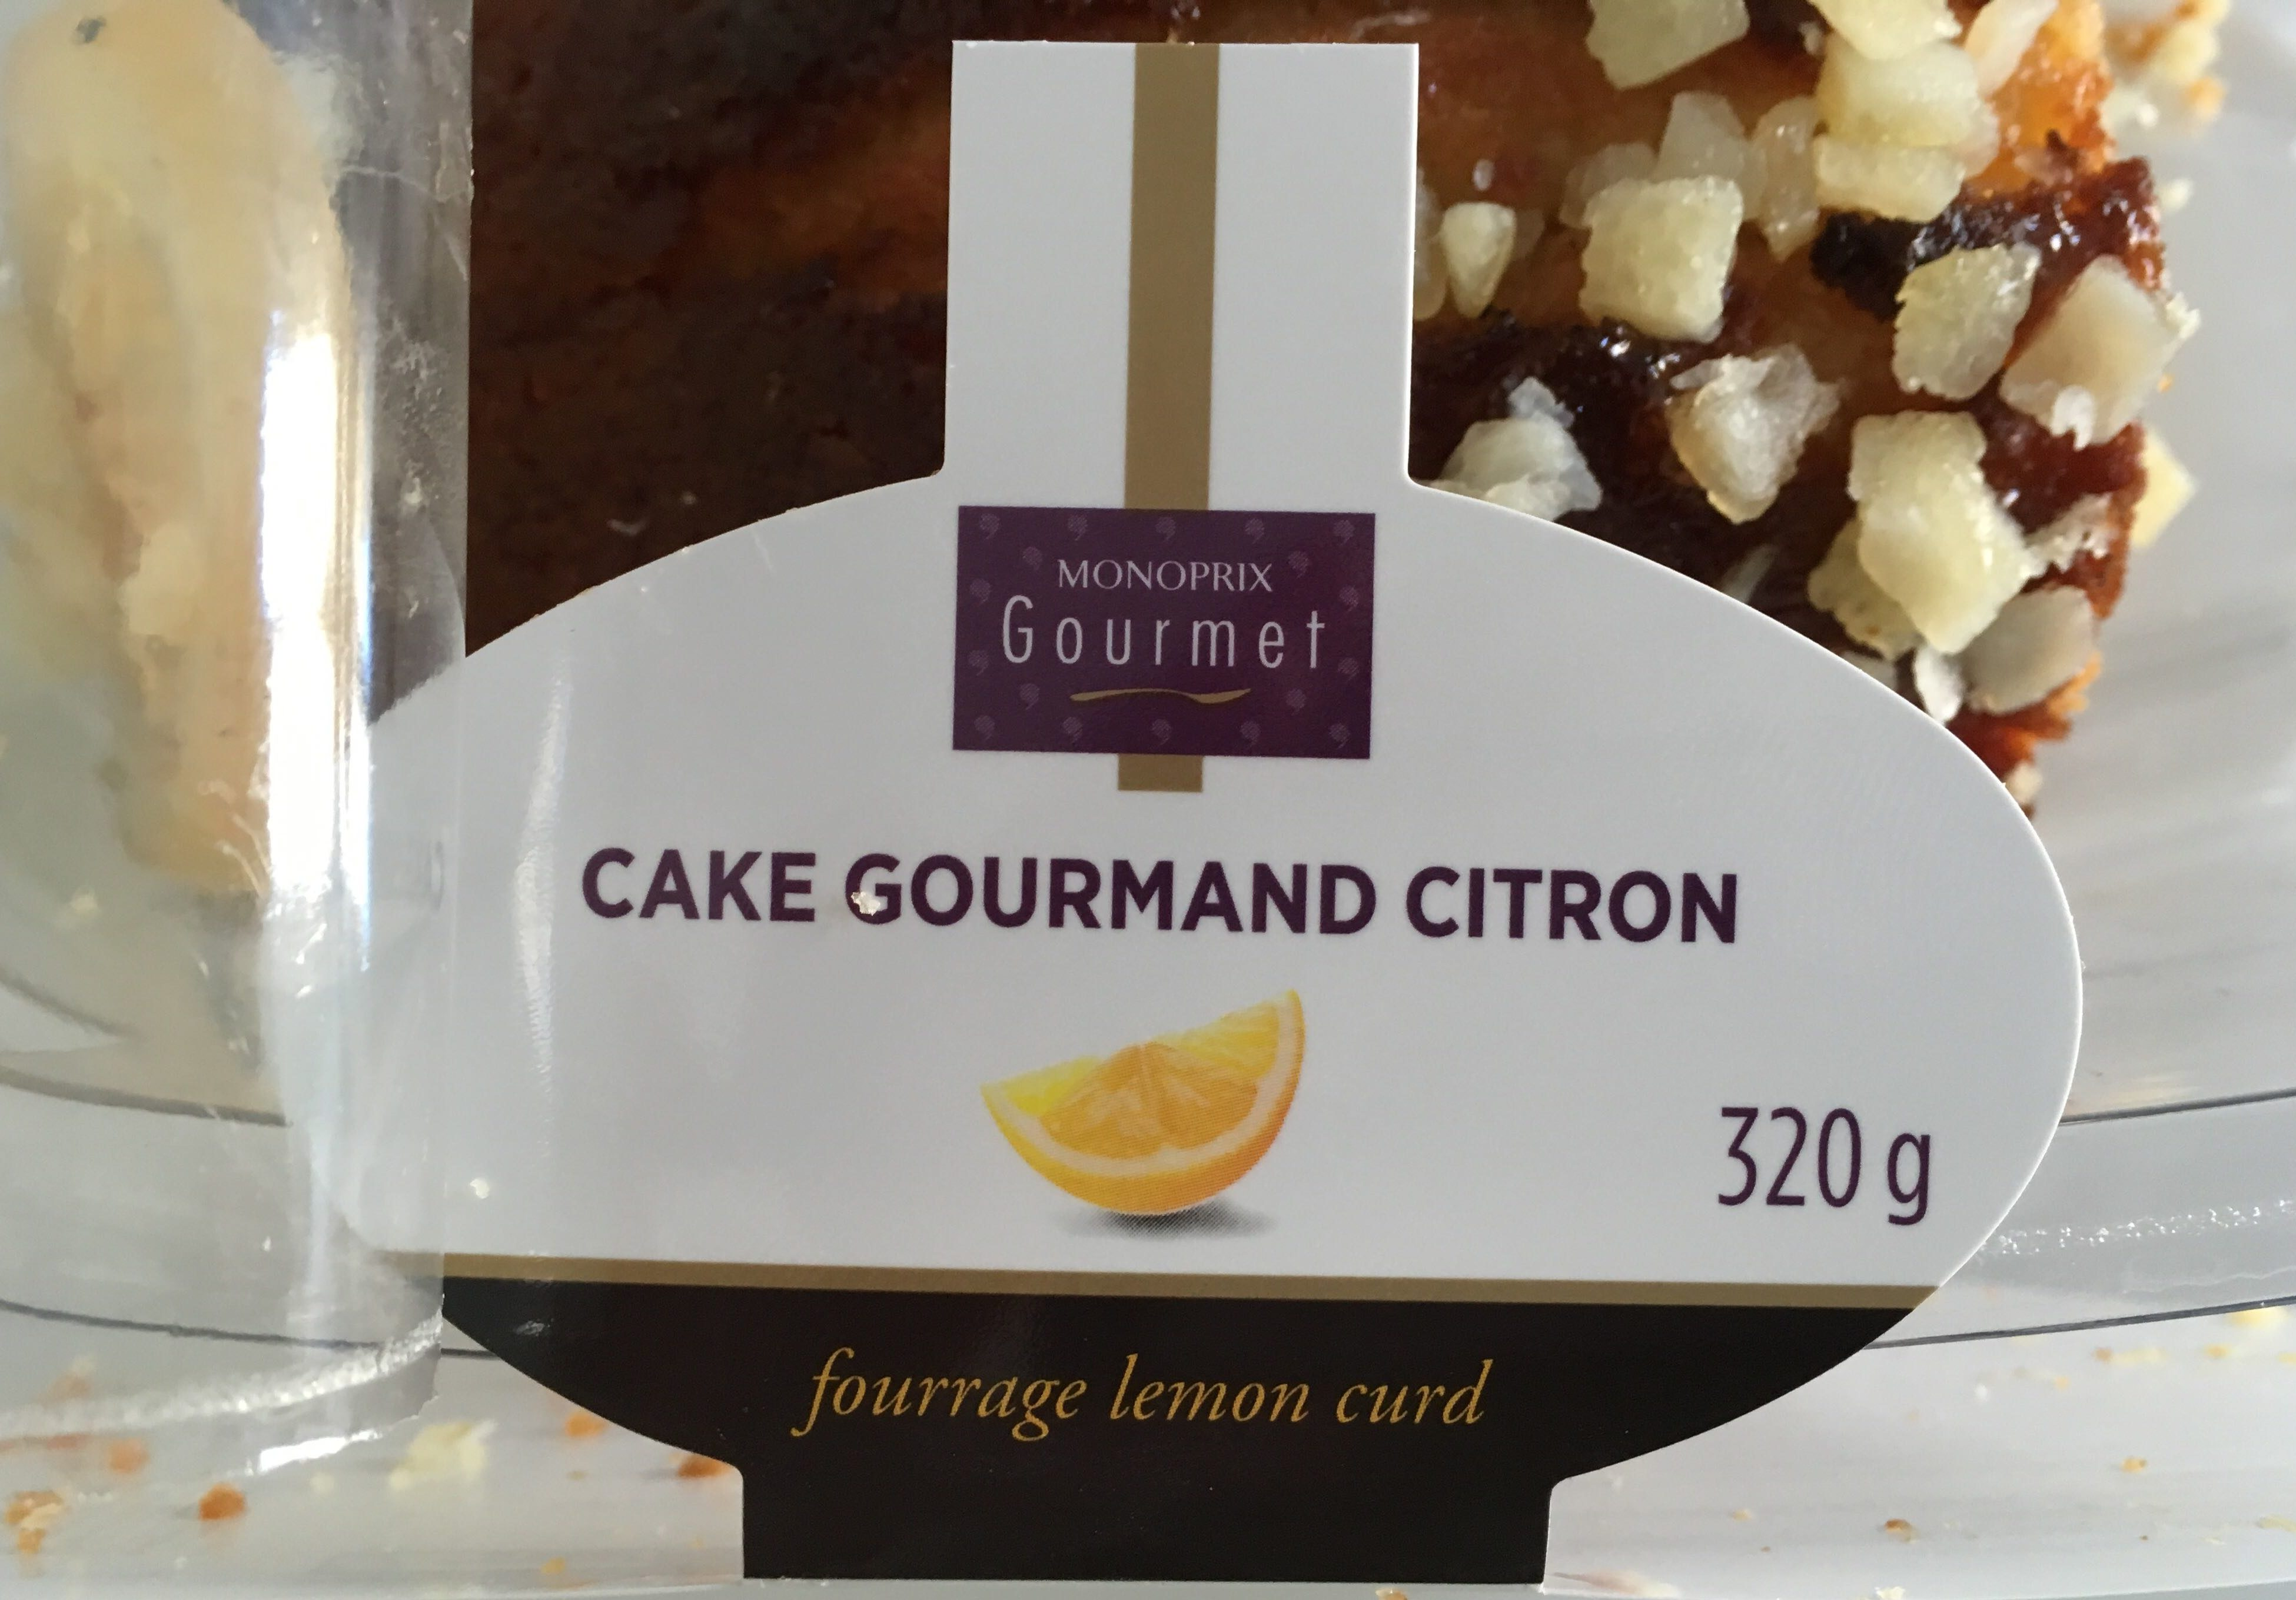 Cake gourmand citron - Product - fr